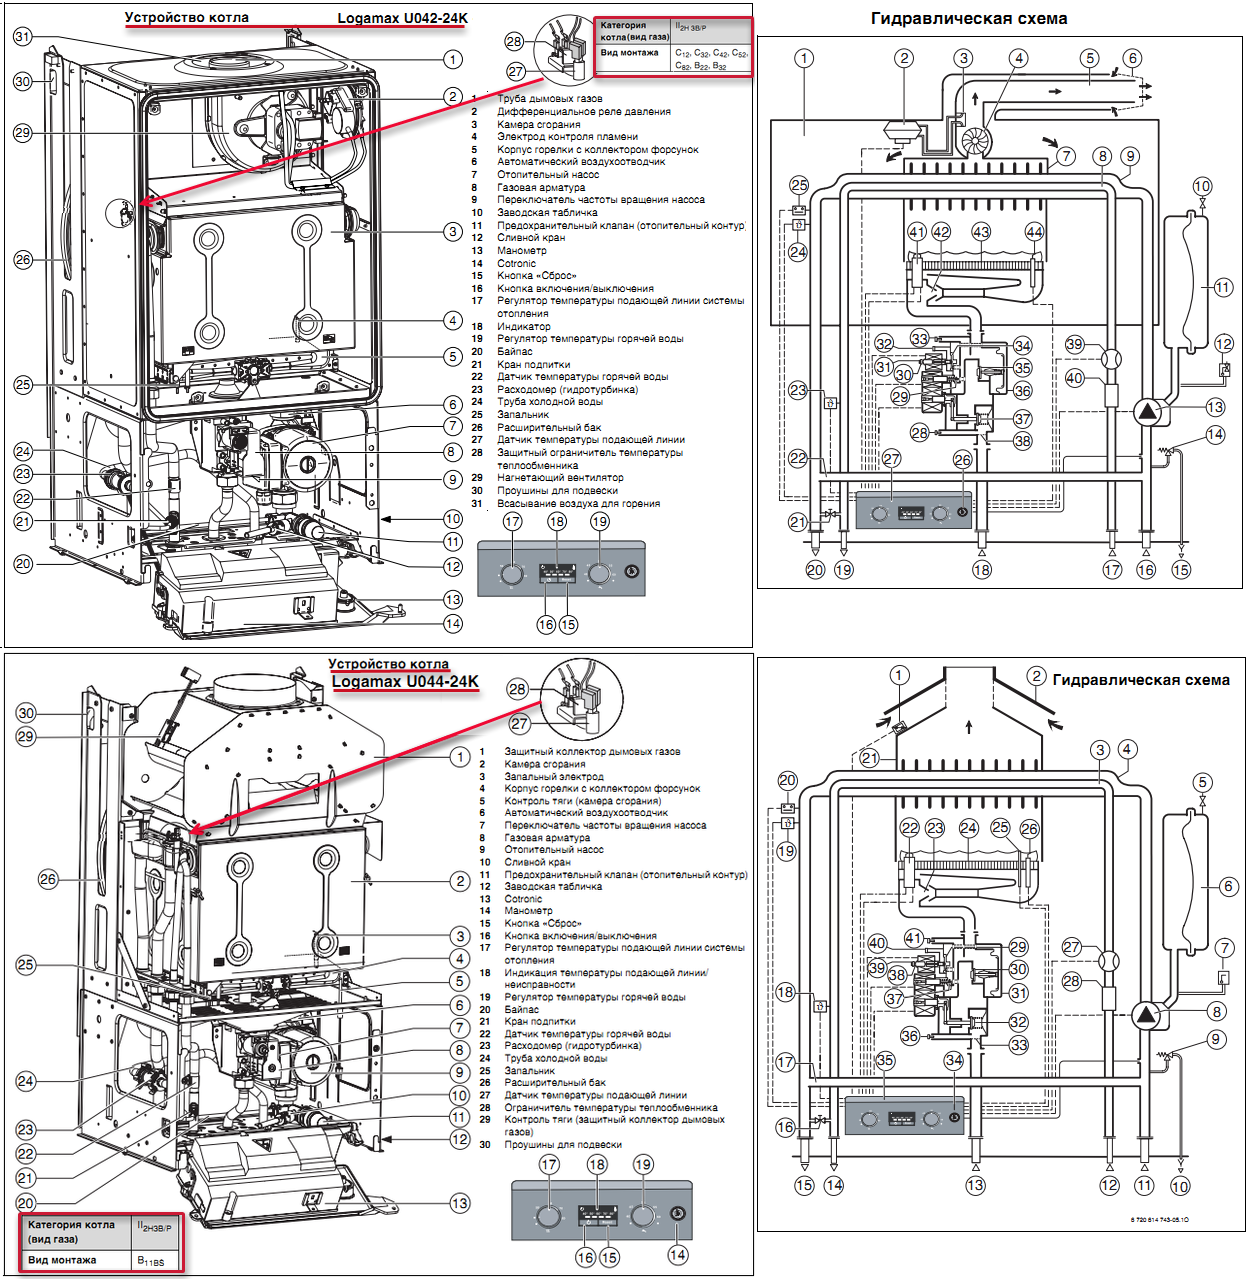 Теплообменник на buderus 42-24 термодинамика расчтное задание теплообменник